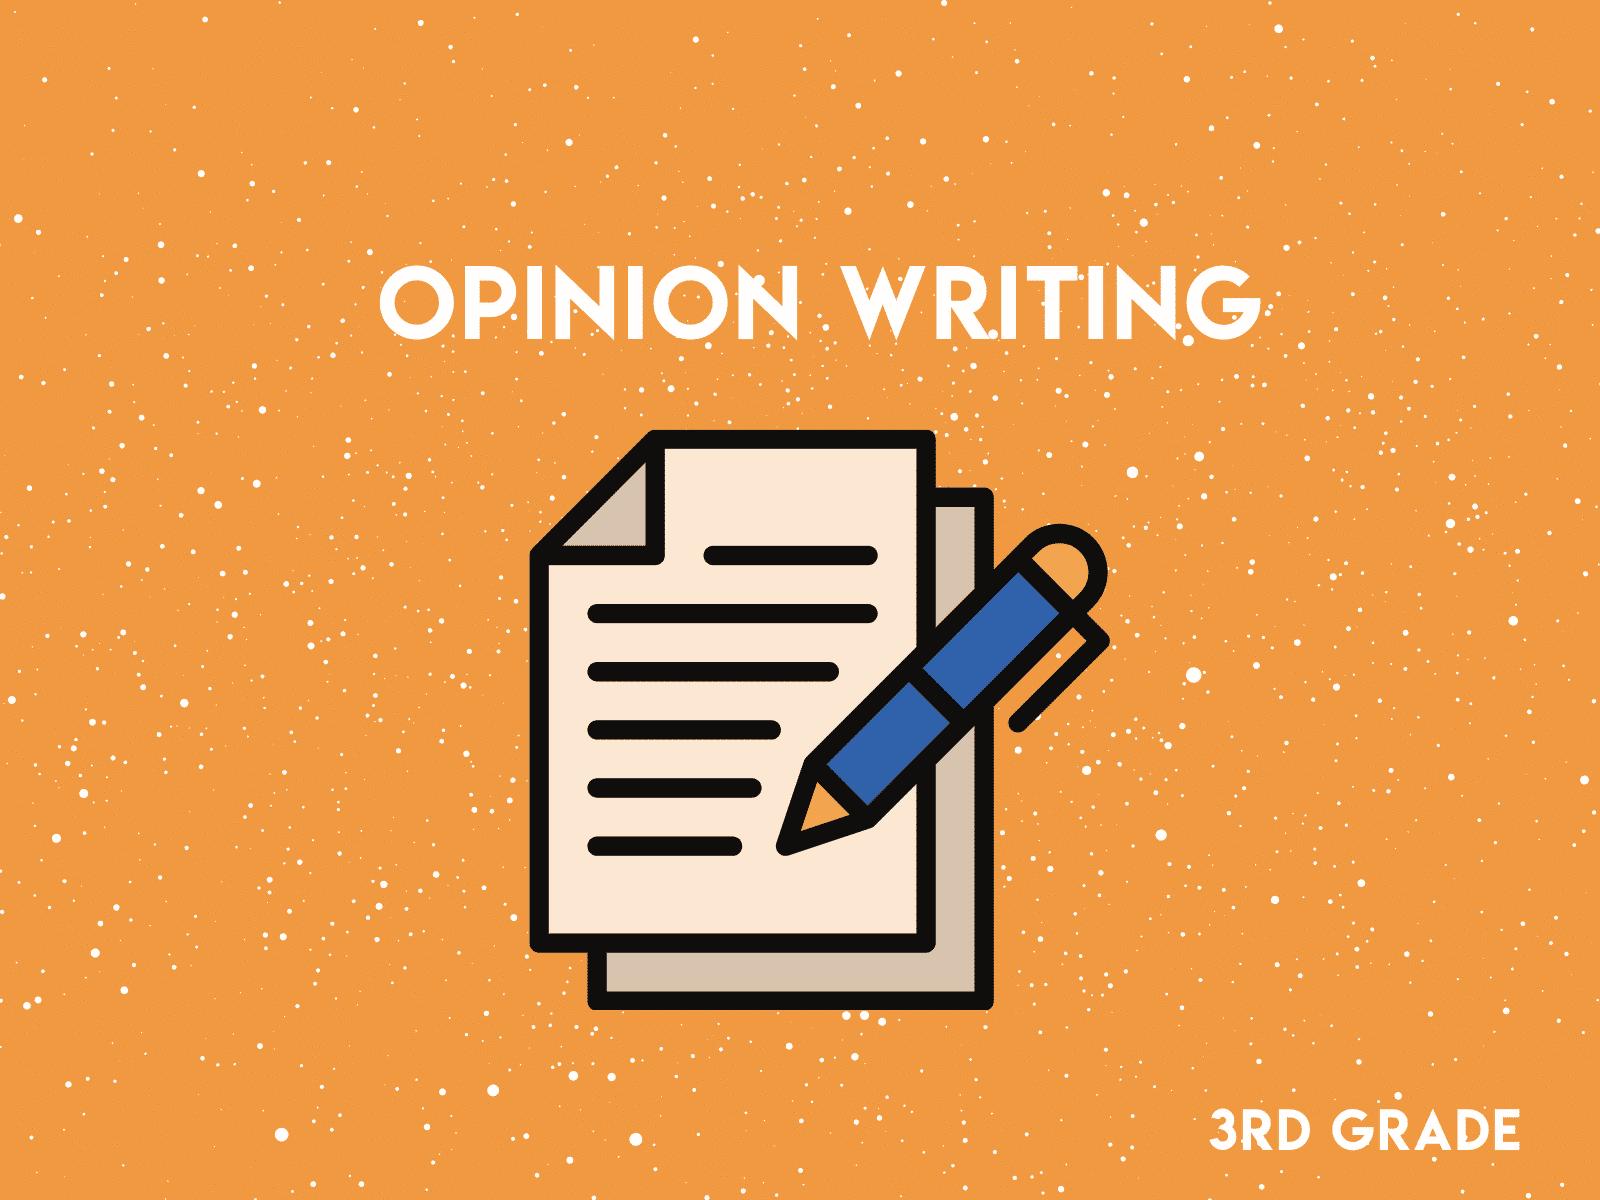 Opinion Writing 3rd Grade